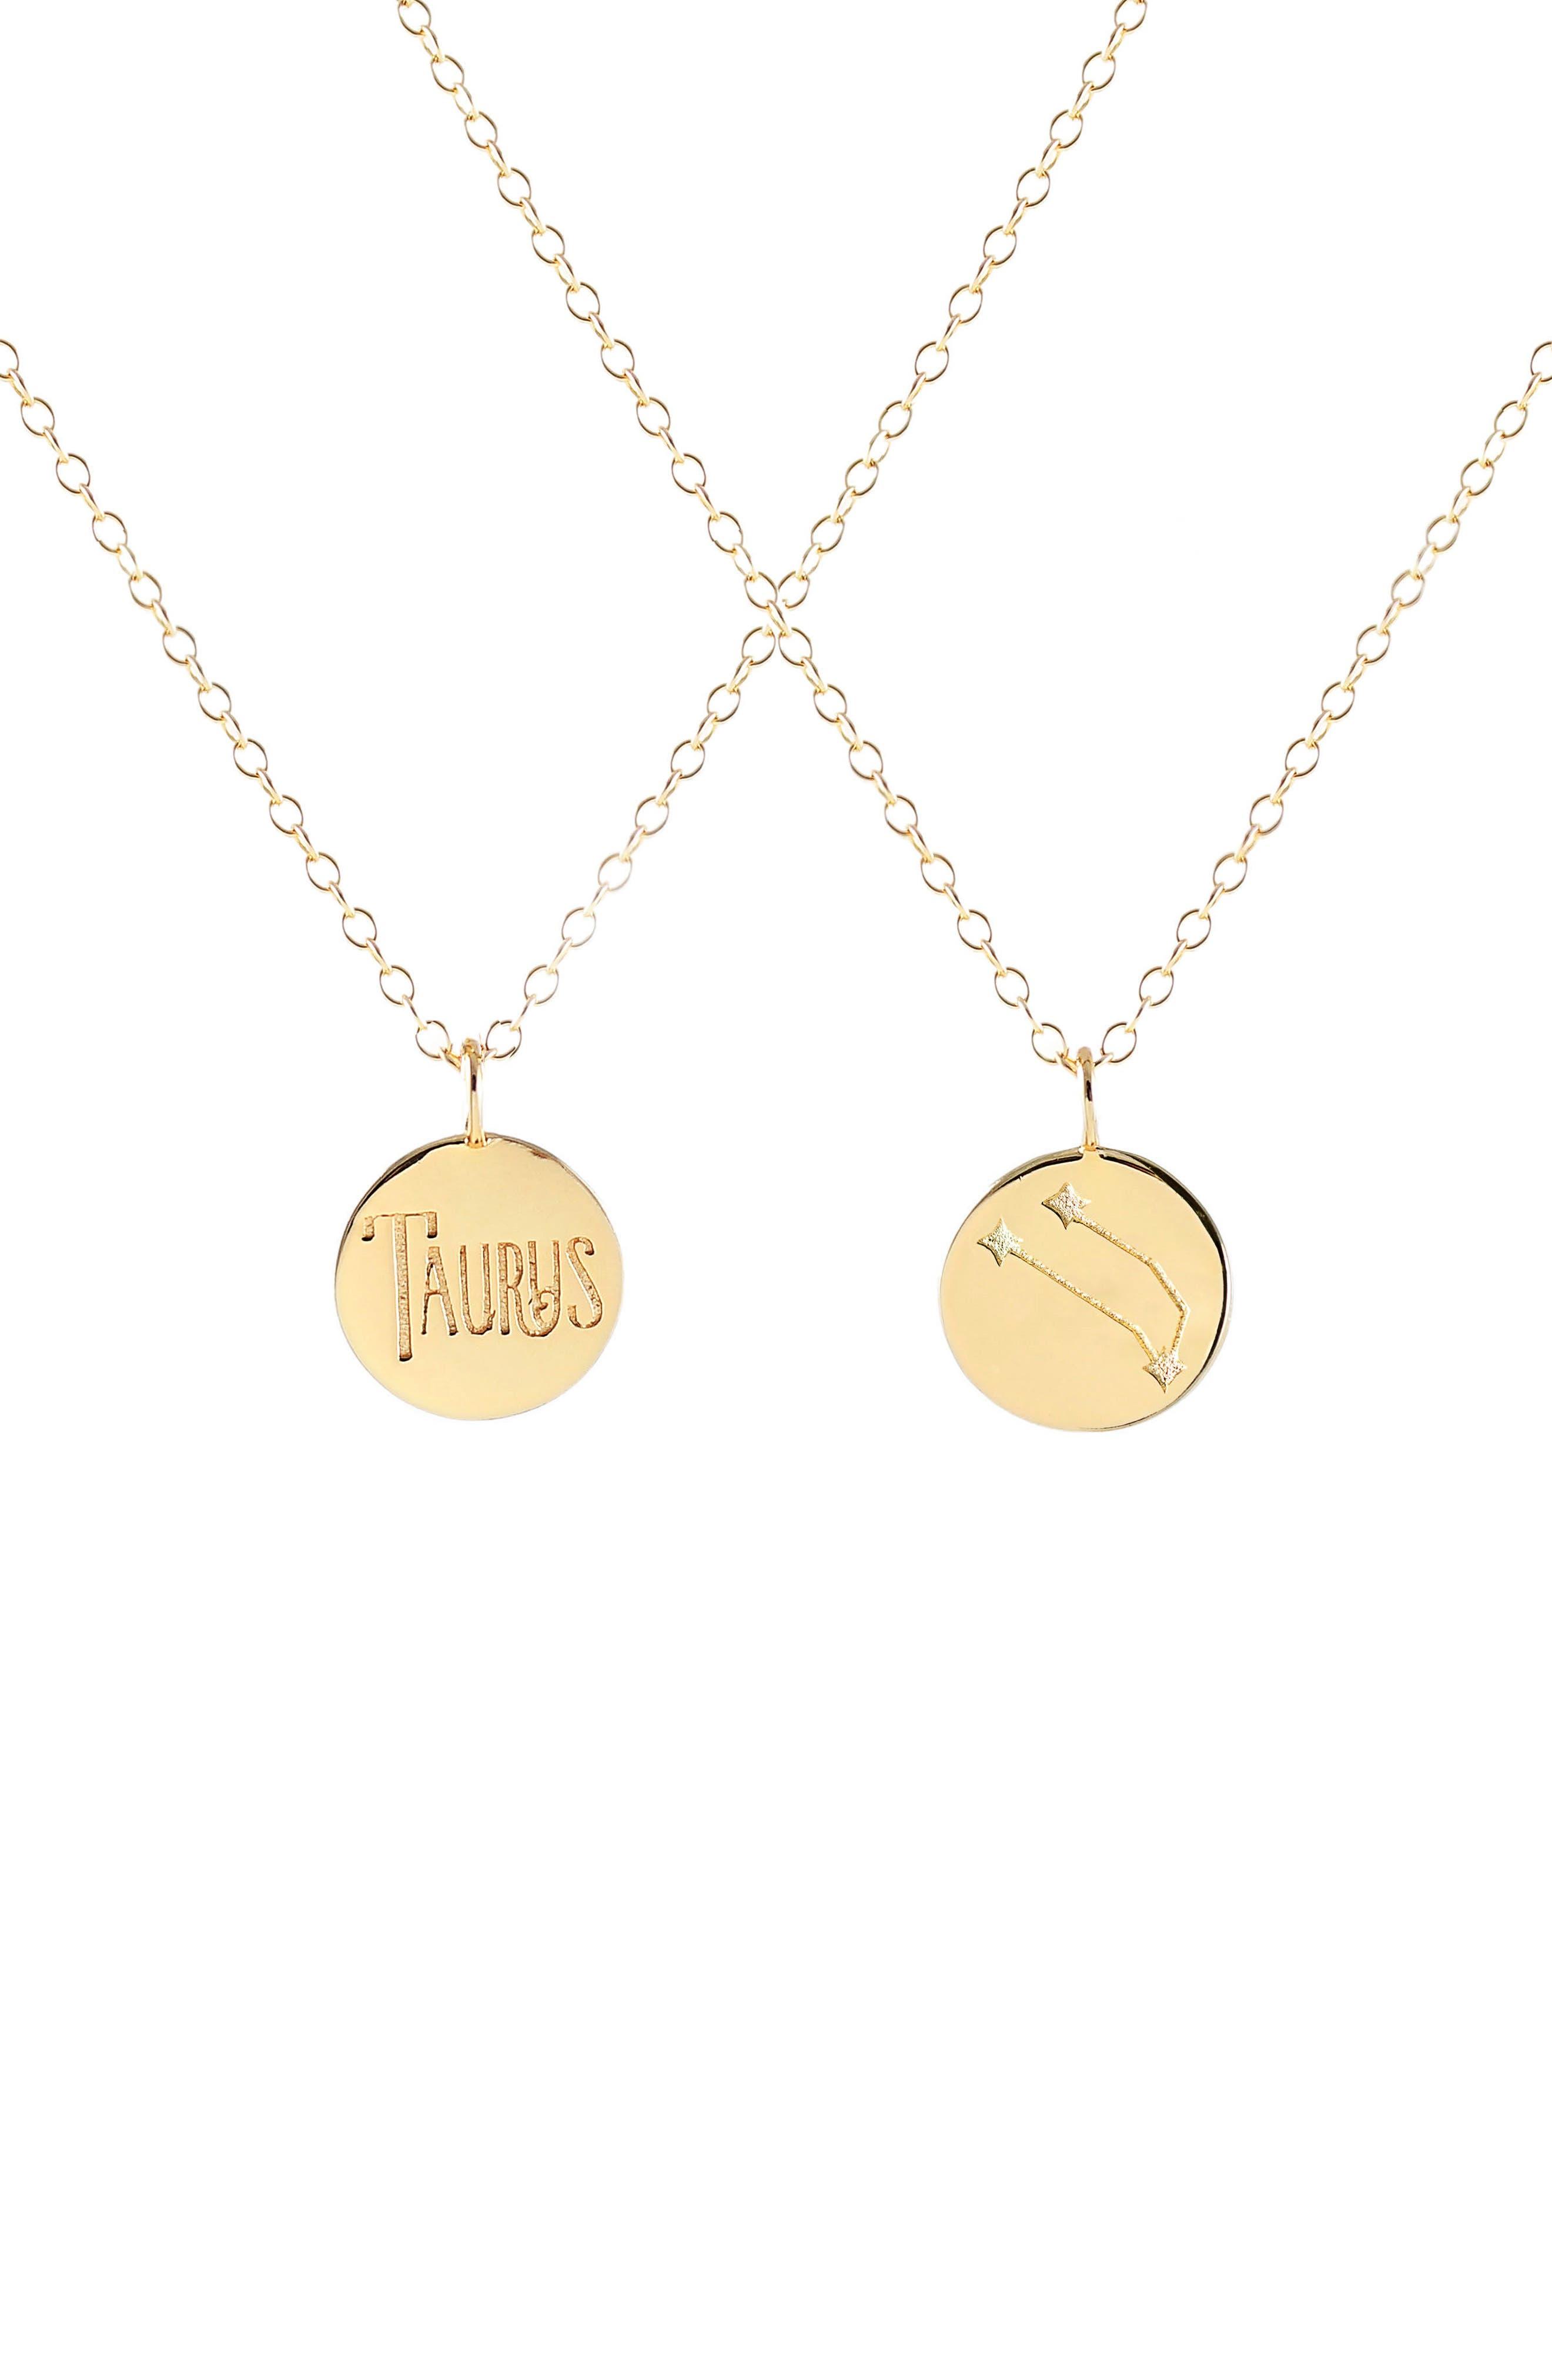 Zodiac Charm Necklace,                             Main thumbnail 1, color,                             Taurus - Gold